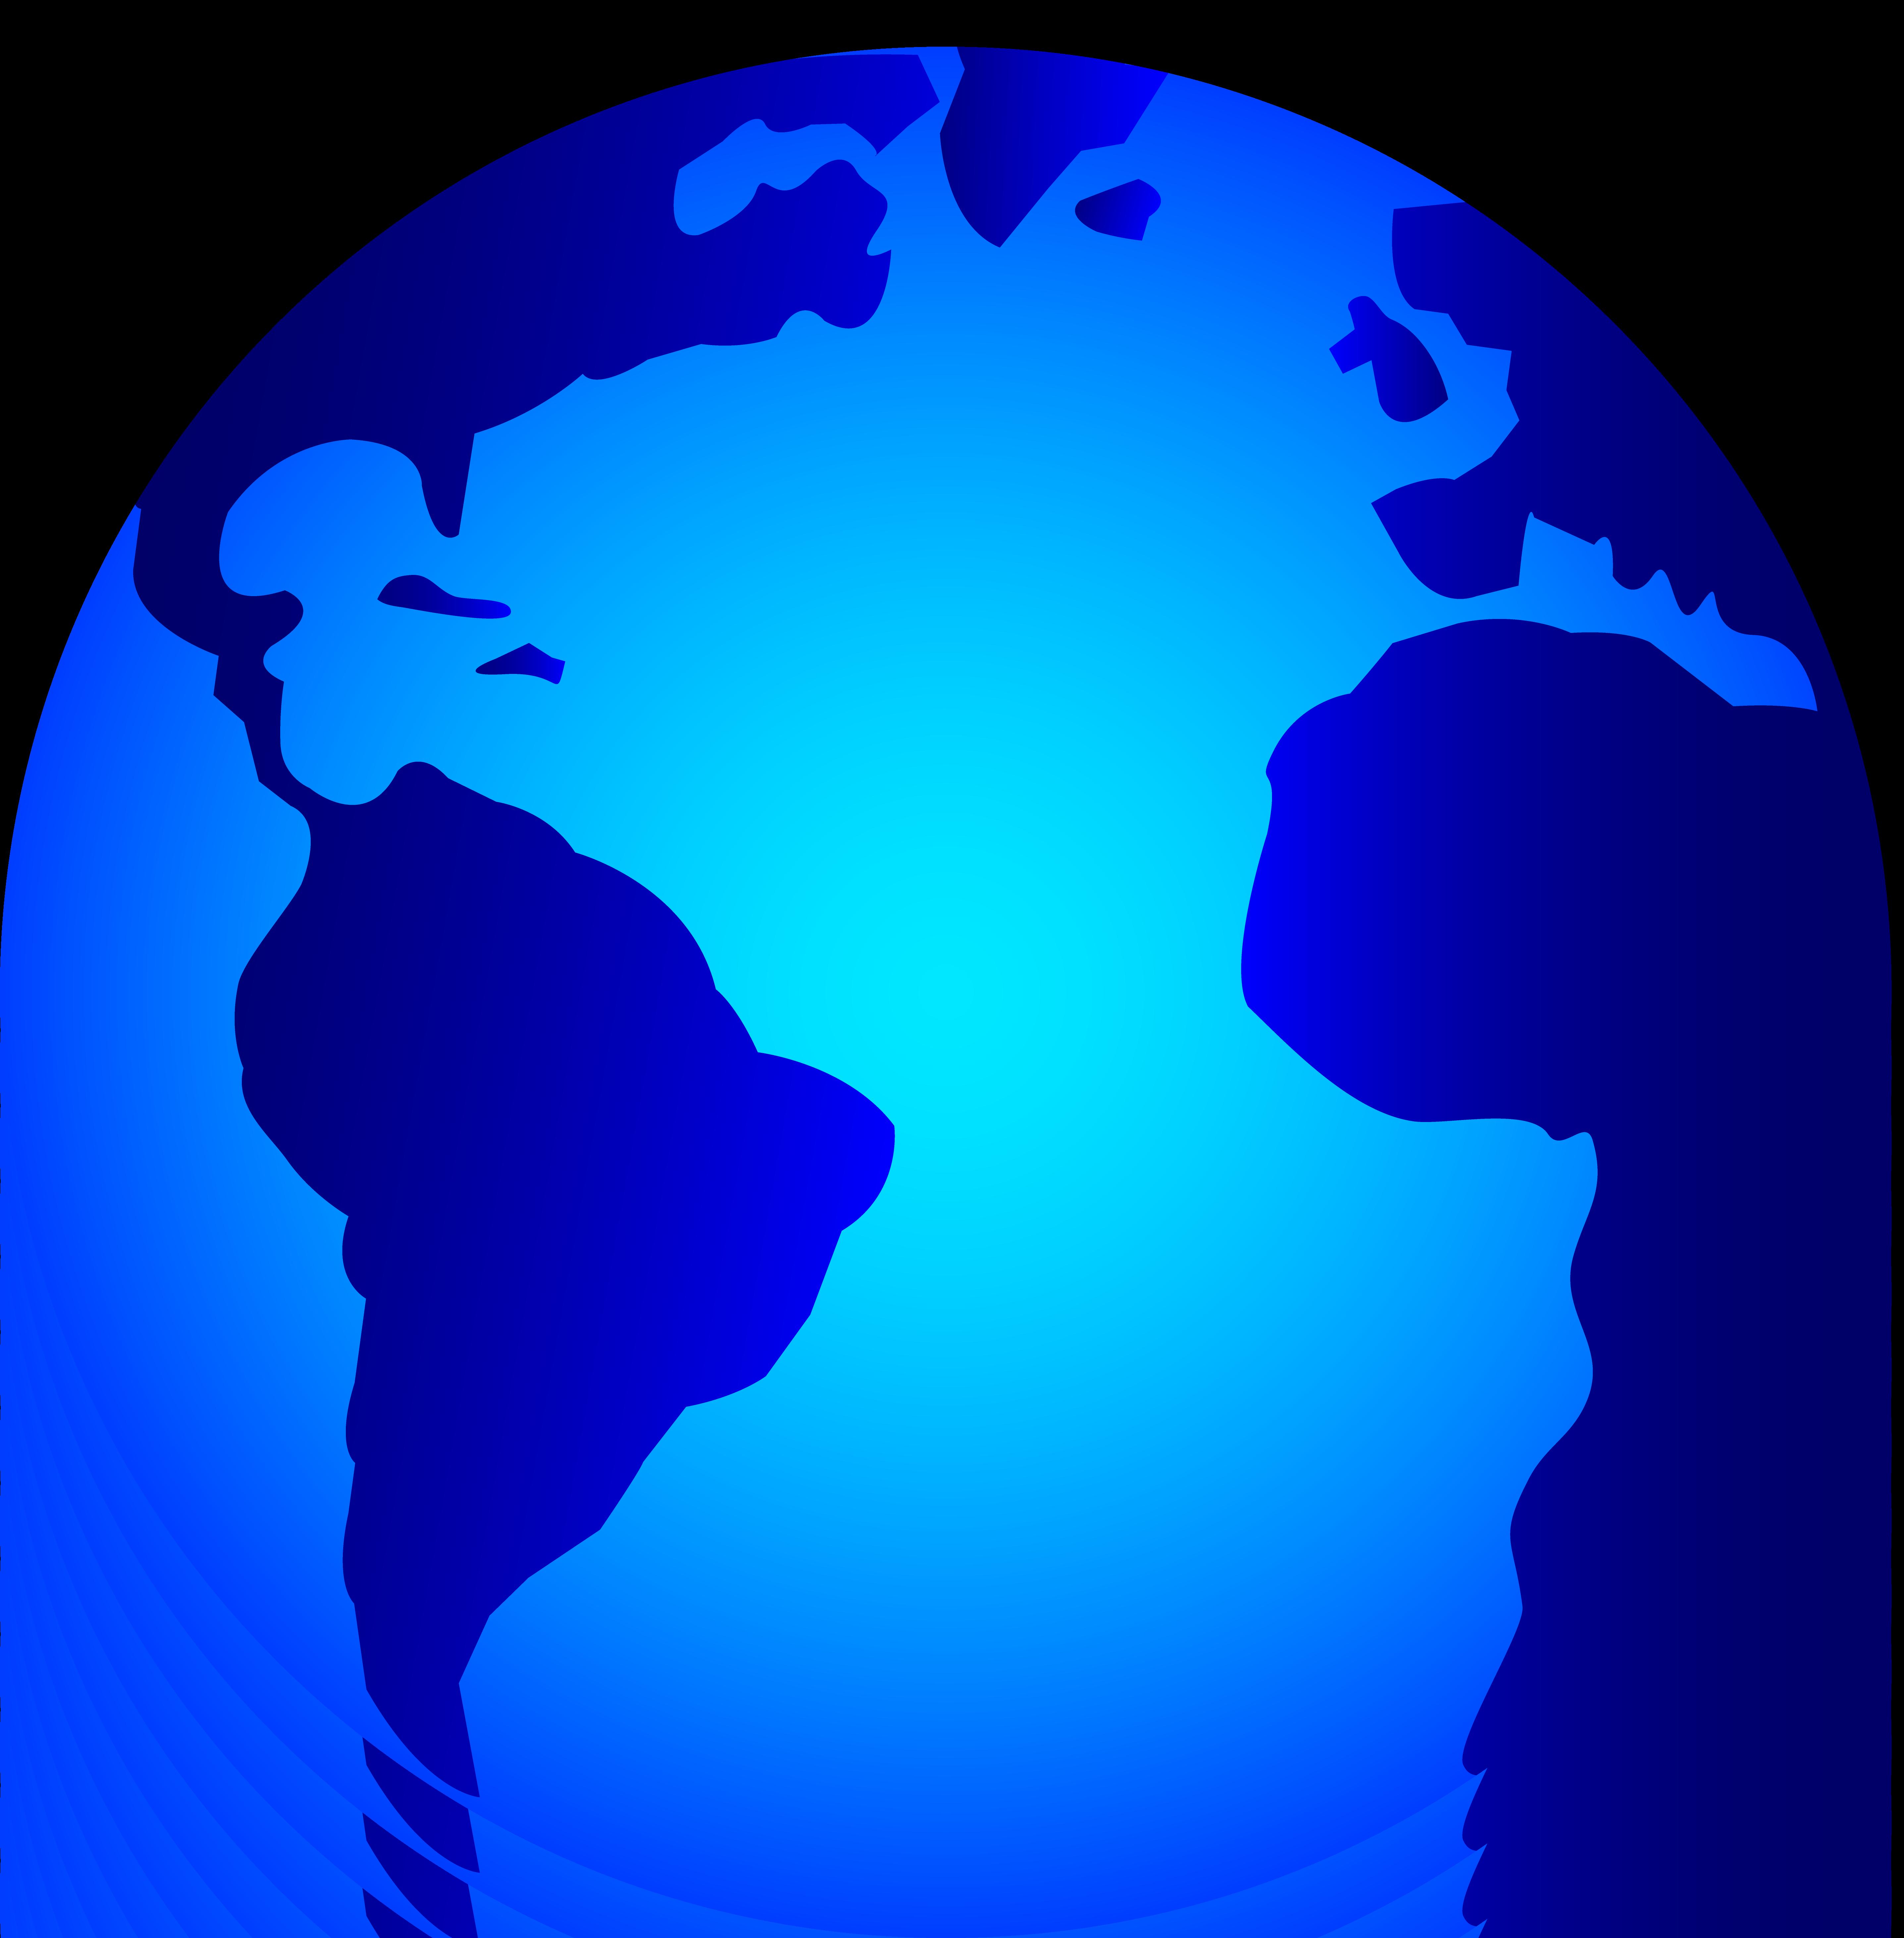 5748x5852 Shiny Blue Planet Earth